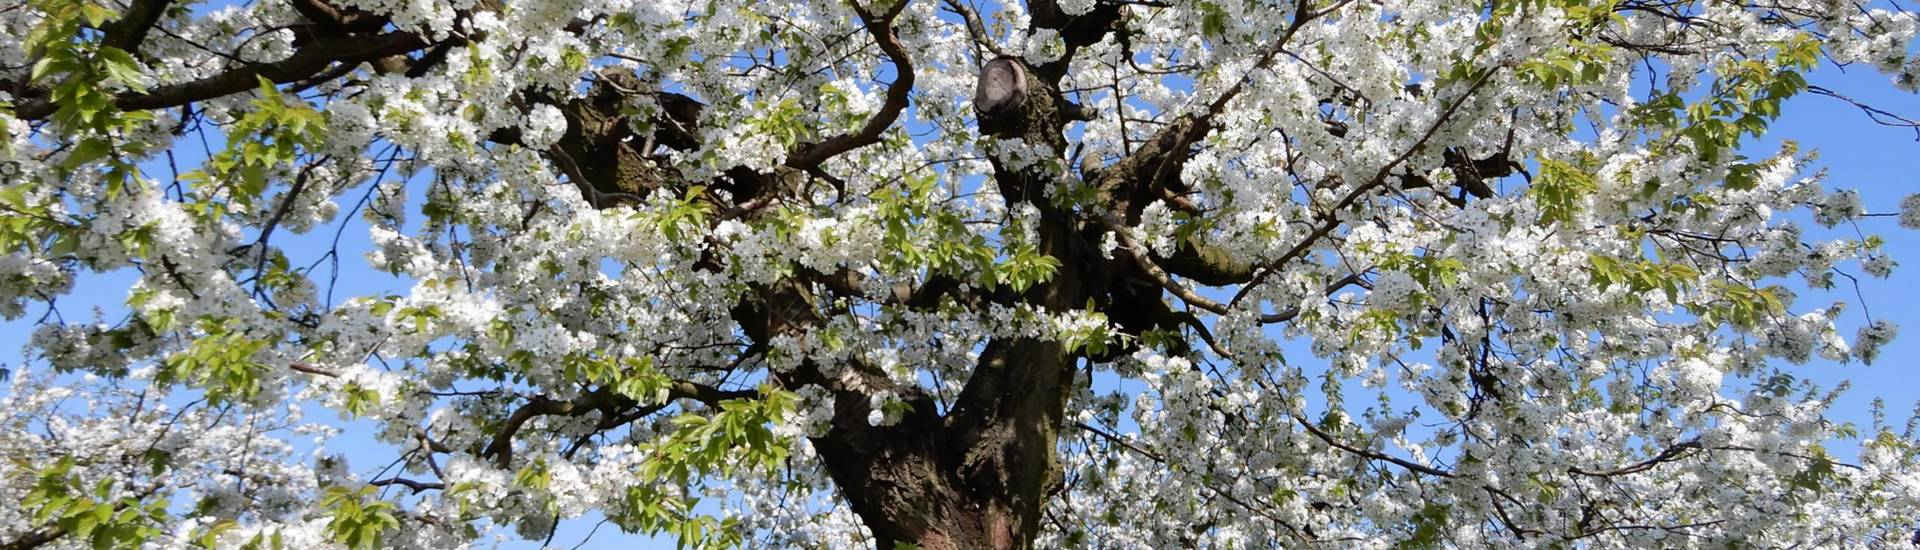 kirschblüte in wesendahl  ©Elke Fritzen